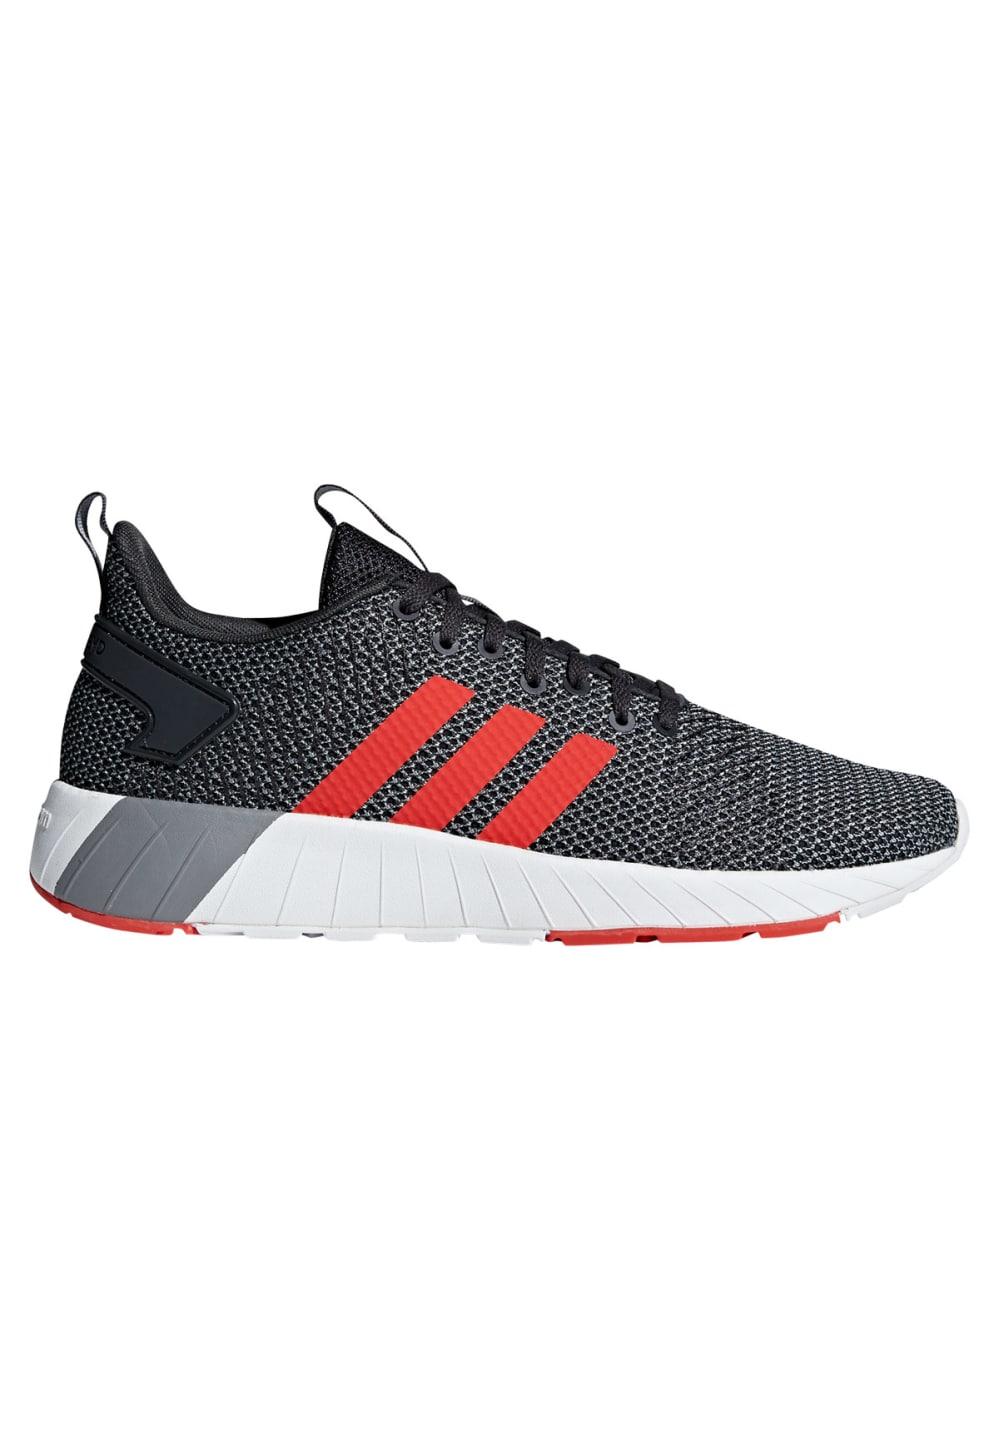 Questar Running Noir Chaussures Pour Byd Adidas Homme 8wnvNm0O